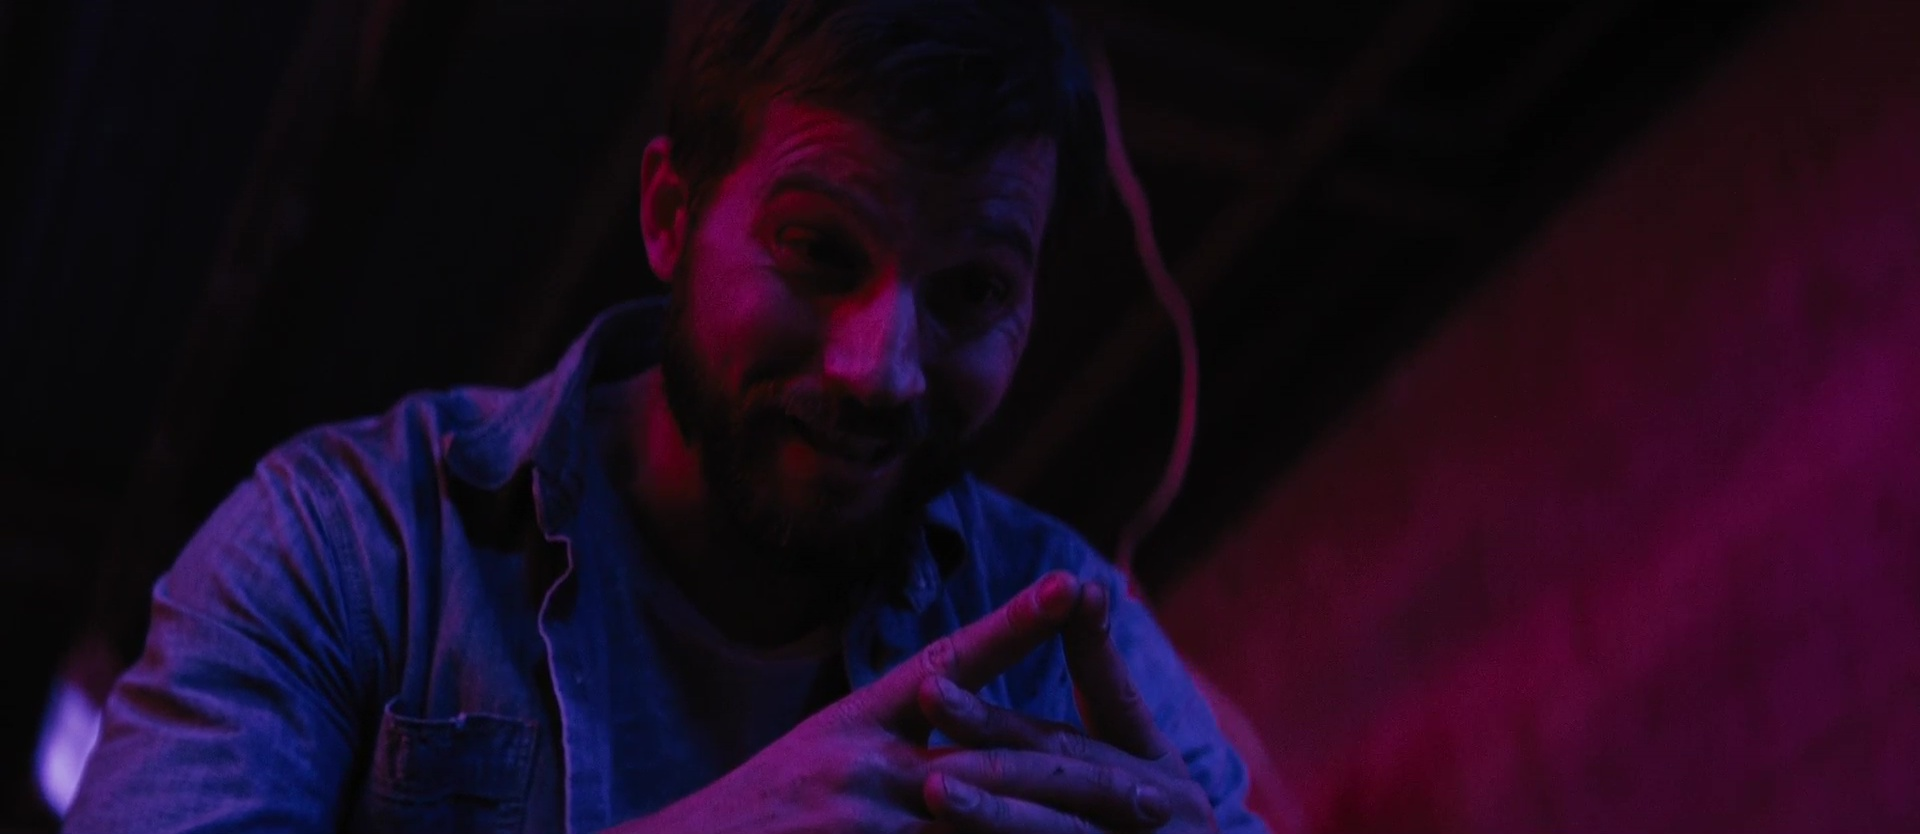 UPGRADE de Leigh Whannell (2018)